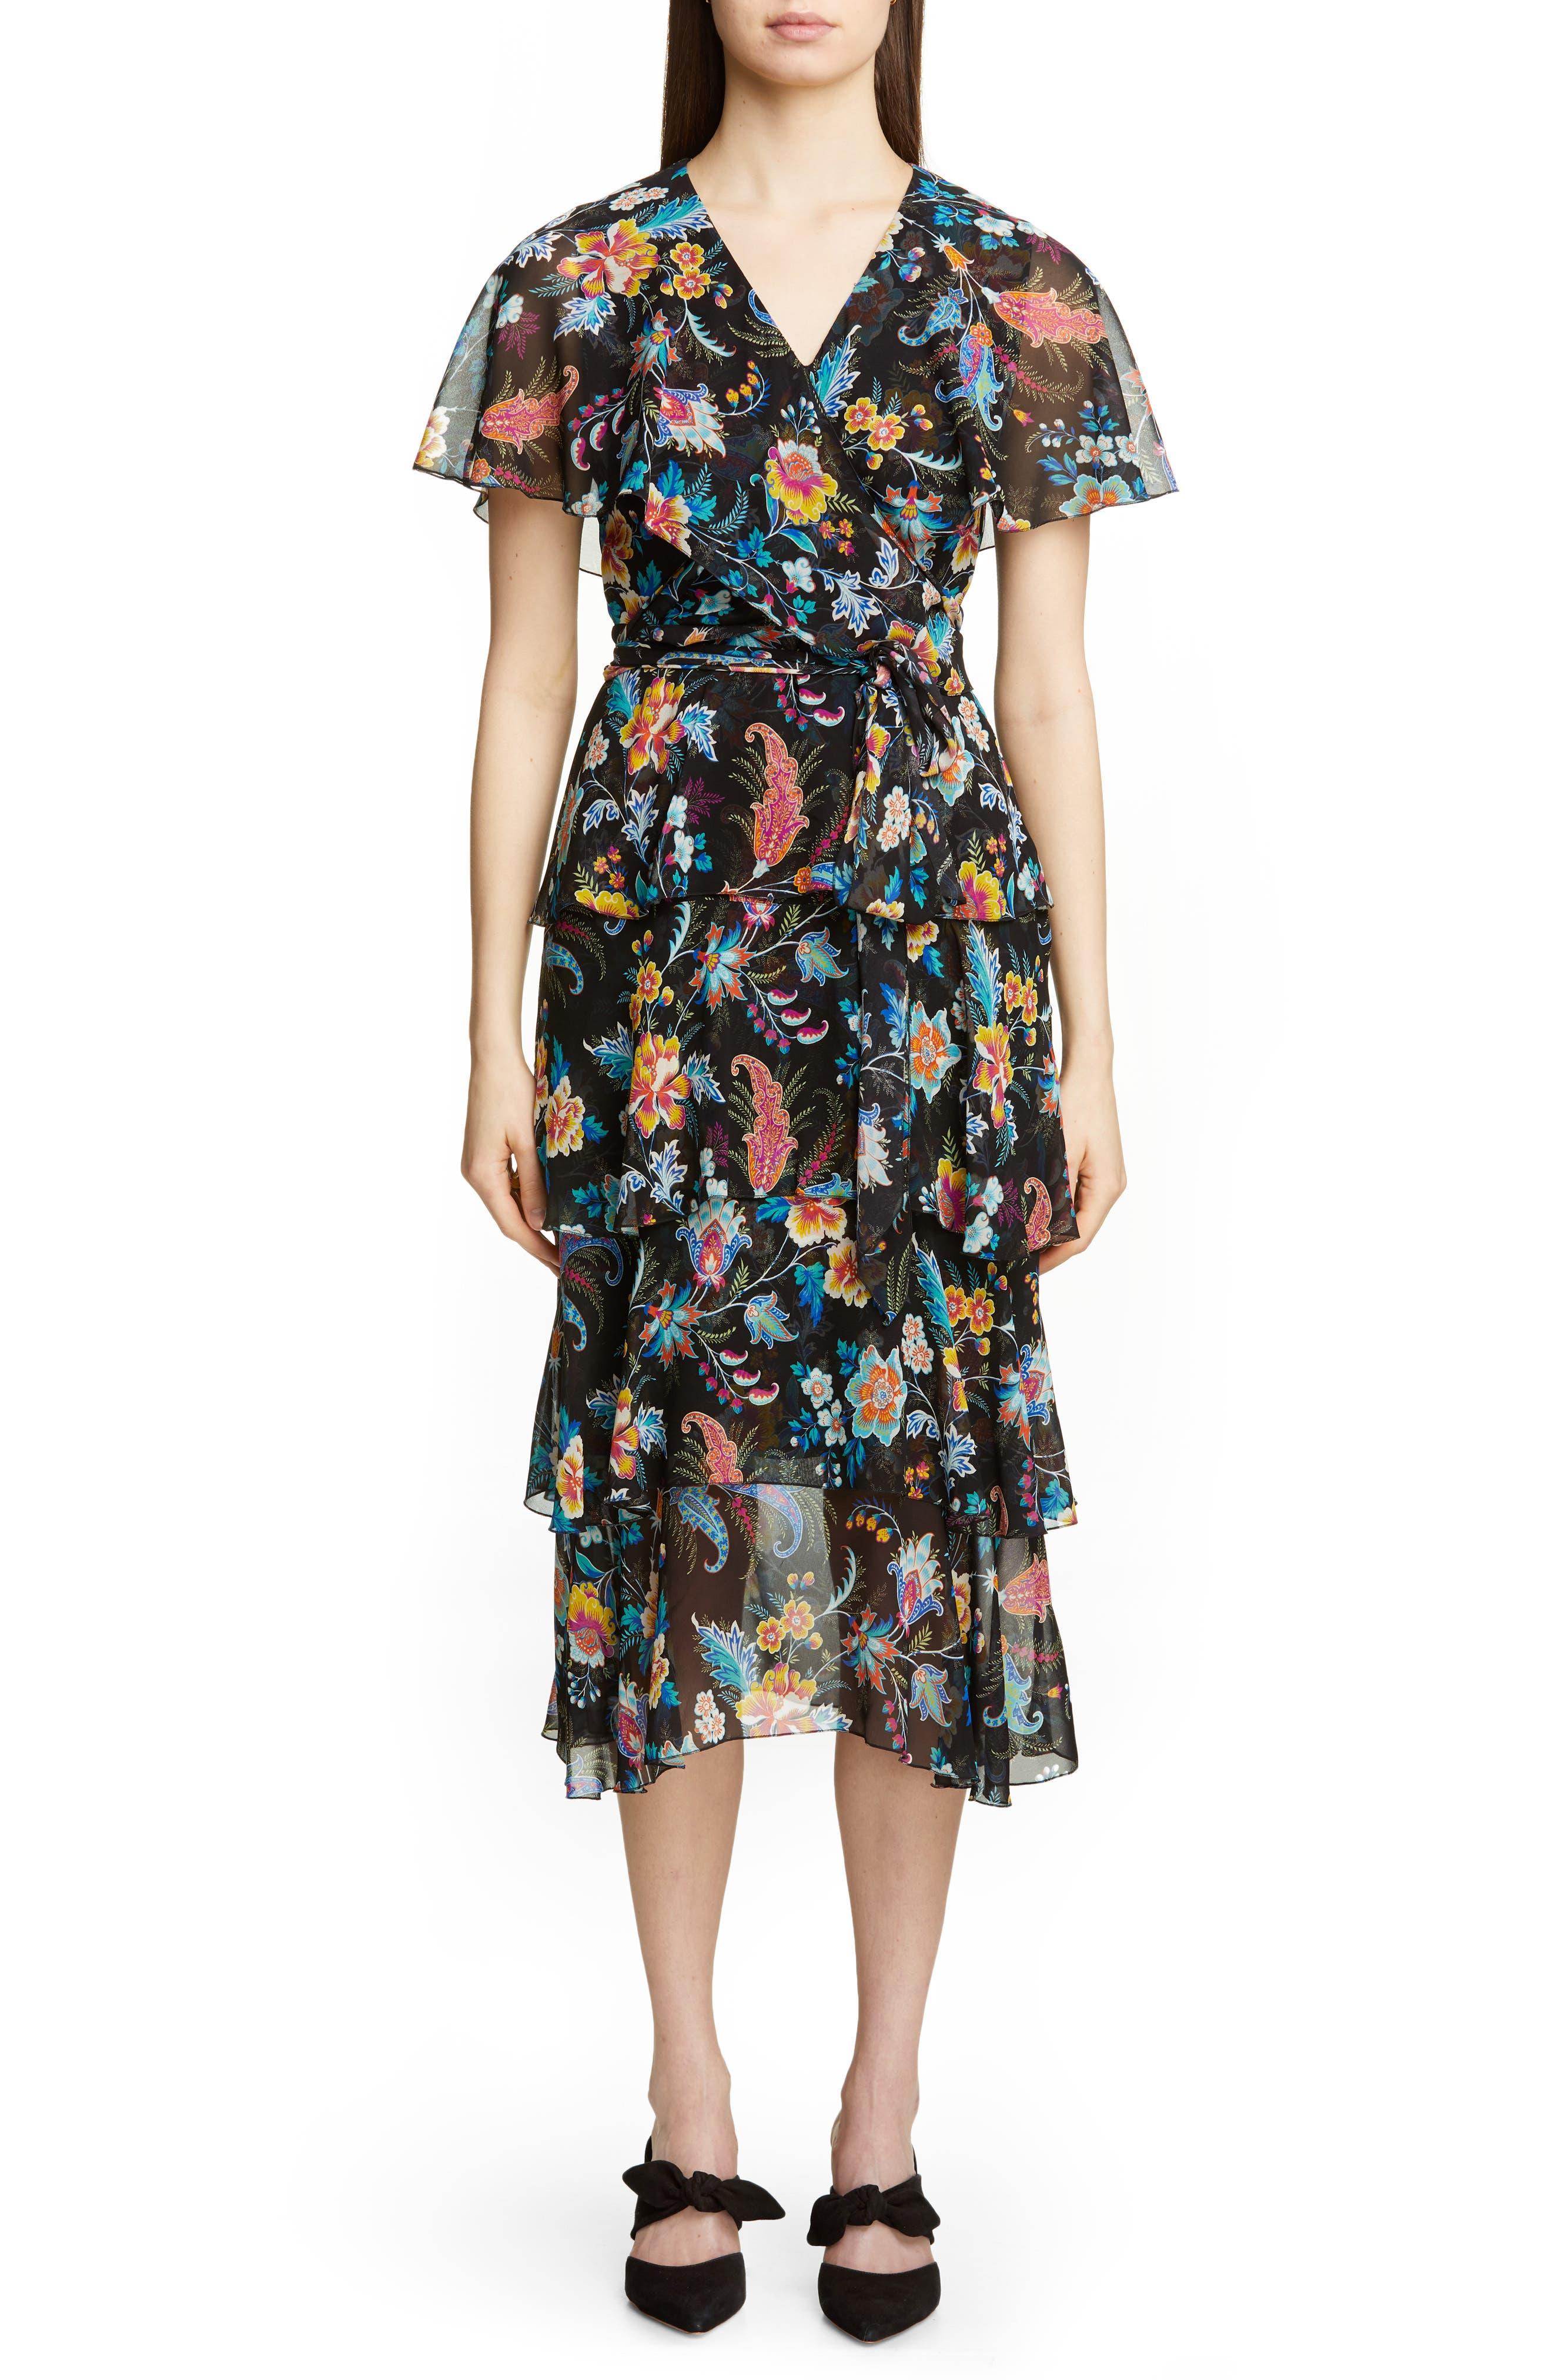 Etro Fern & Floral Print Ruffle Wrap Dress, US / 46 IT - Black